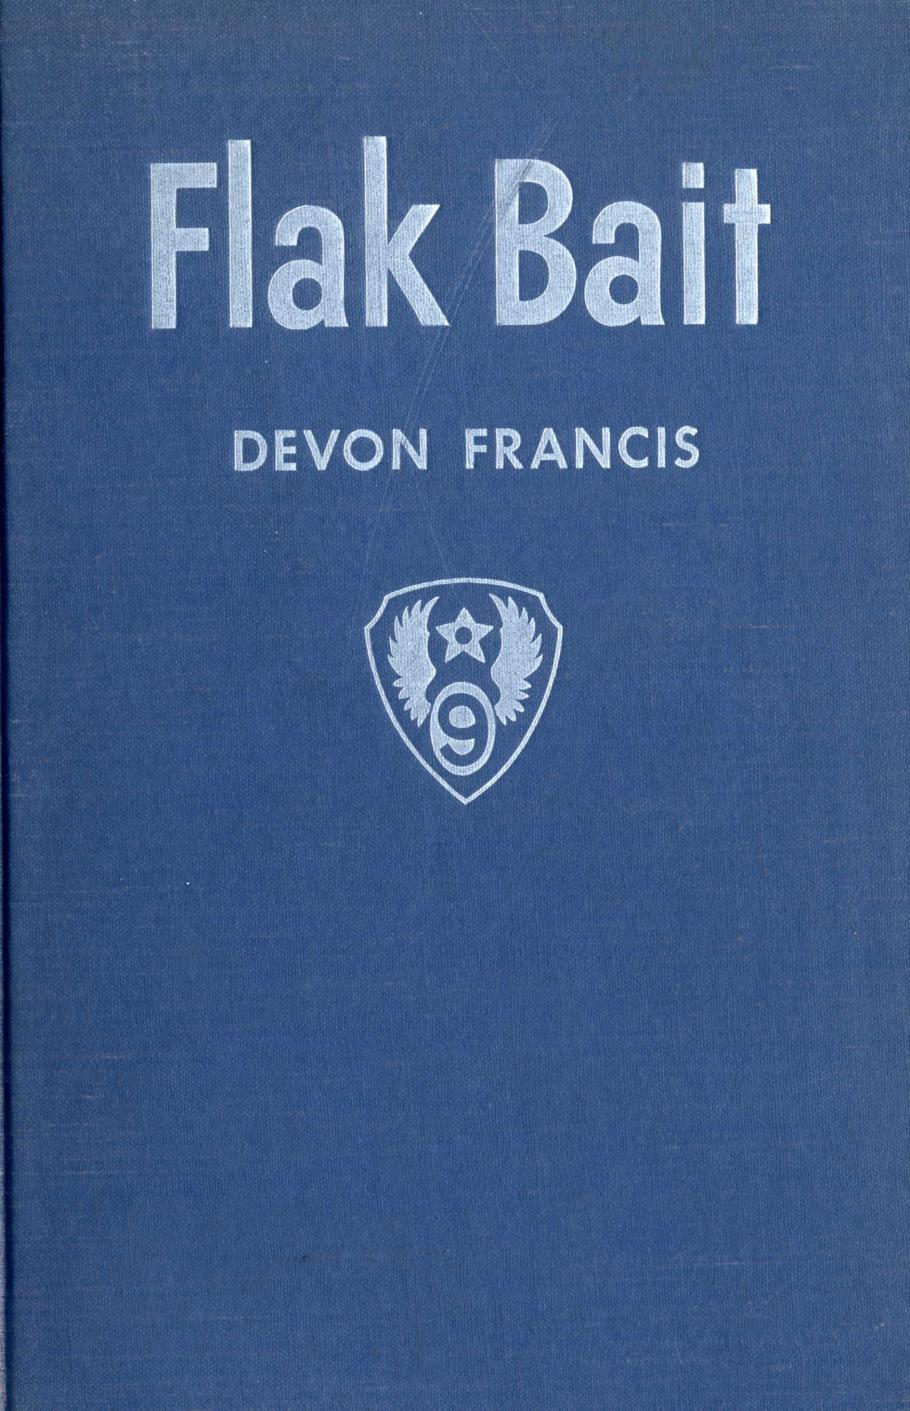 Devon Francis's 1948 Book <i>Flak Bait</i>